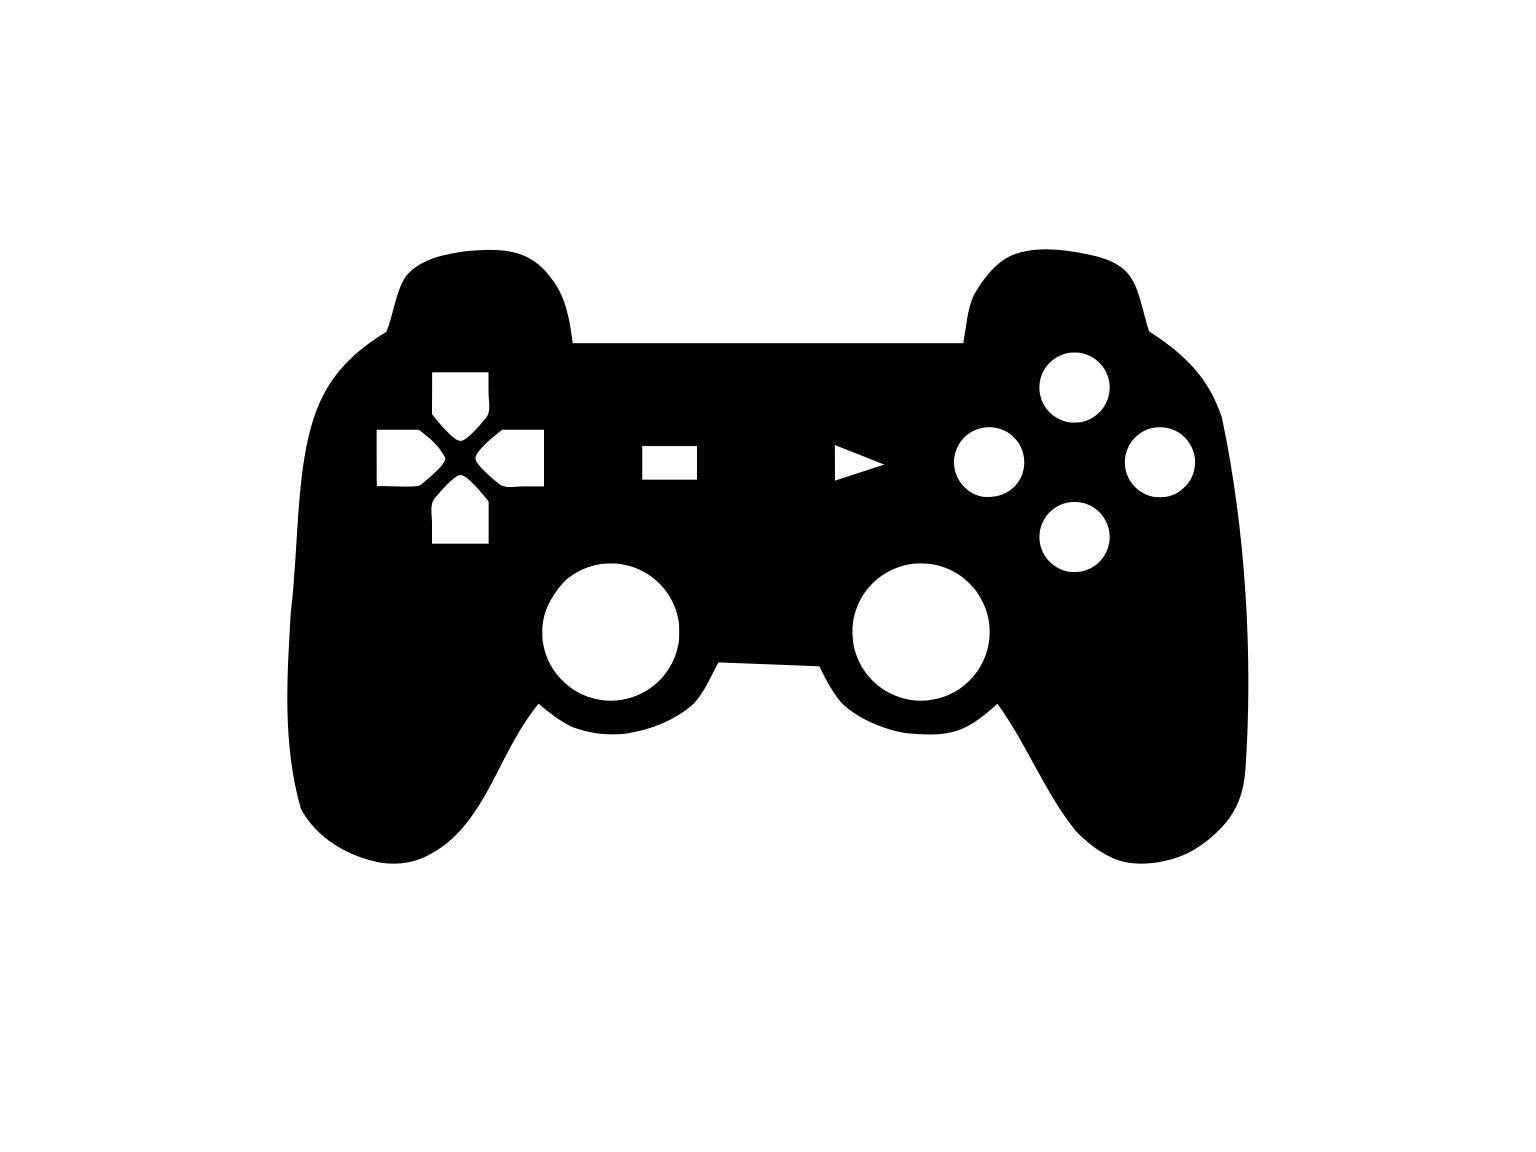 Game Controller Svg Gamer Svg Controller Svg SilhouetteXbox Controller Silhouette